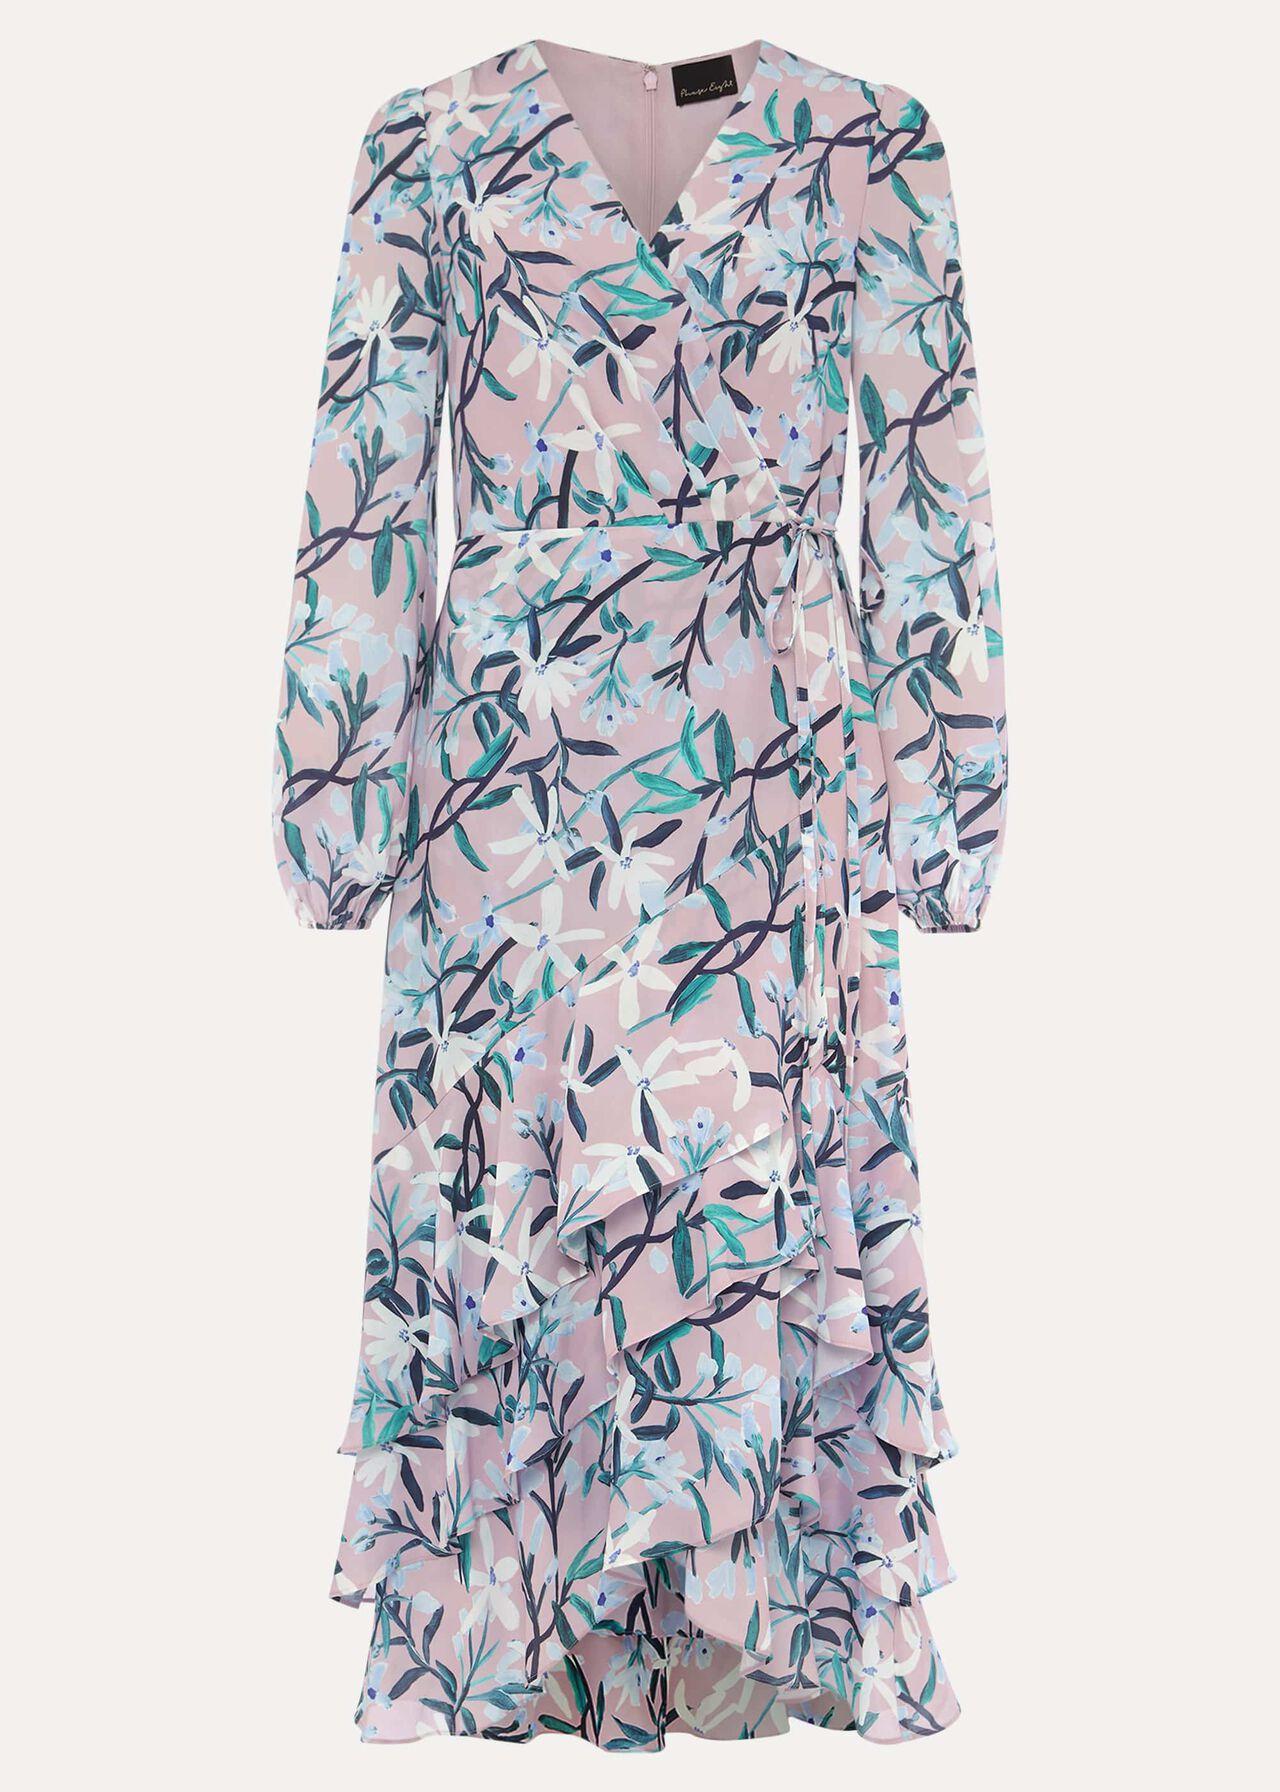 Jenna Floral Frill Dress